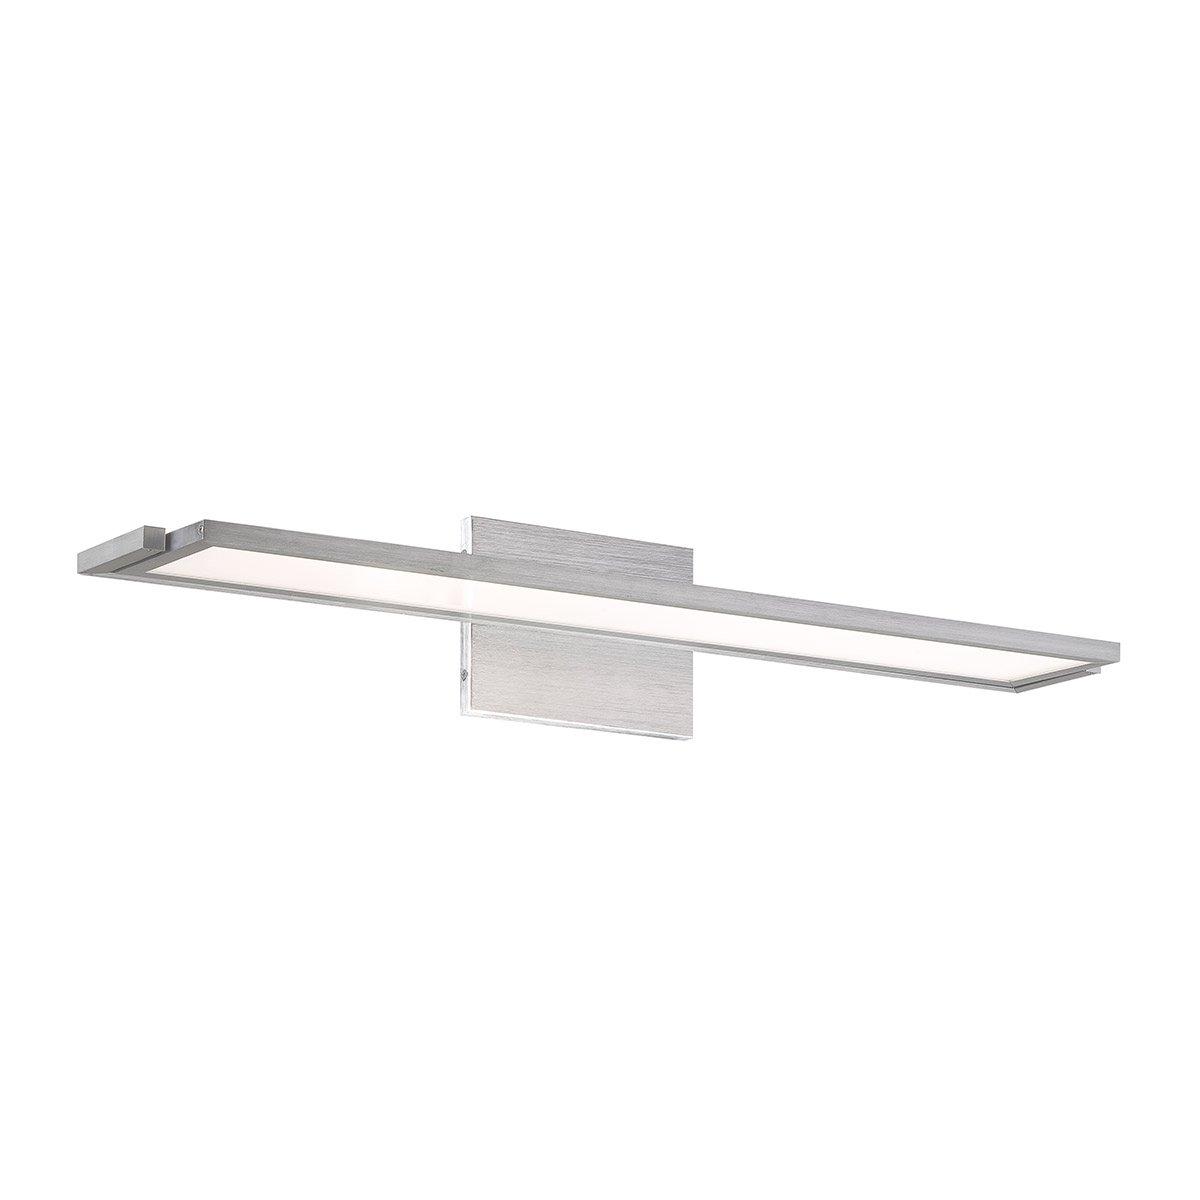 WAC Lighting WS-6724-30-AL Line 24'' LED Soft Bath & Wall Light Fixture, Medium, White/Brushed Aluminum